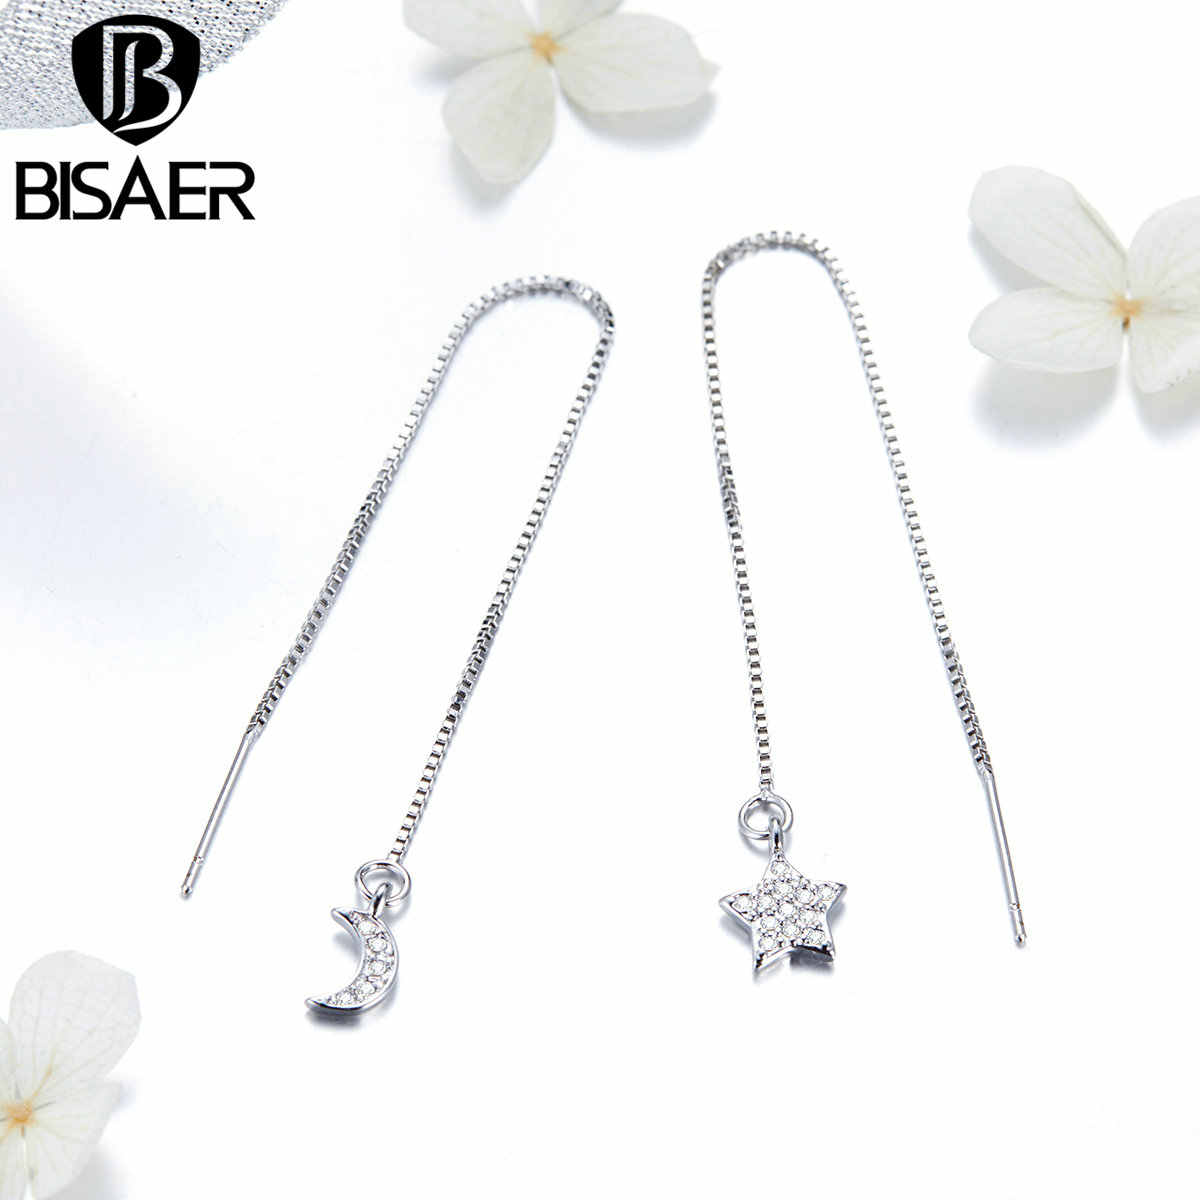 BISAER ירח וכוכב ארוך תיבת שרשרת Drop עגילים לנשים עדין קוריאני תכשיטים Brincos ילדה מתנות GSE166